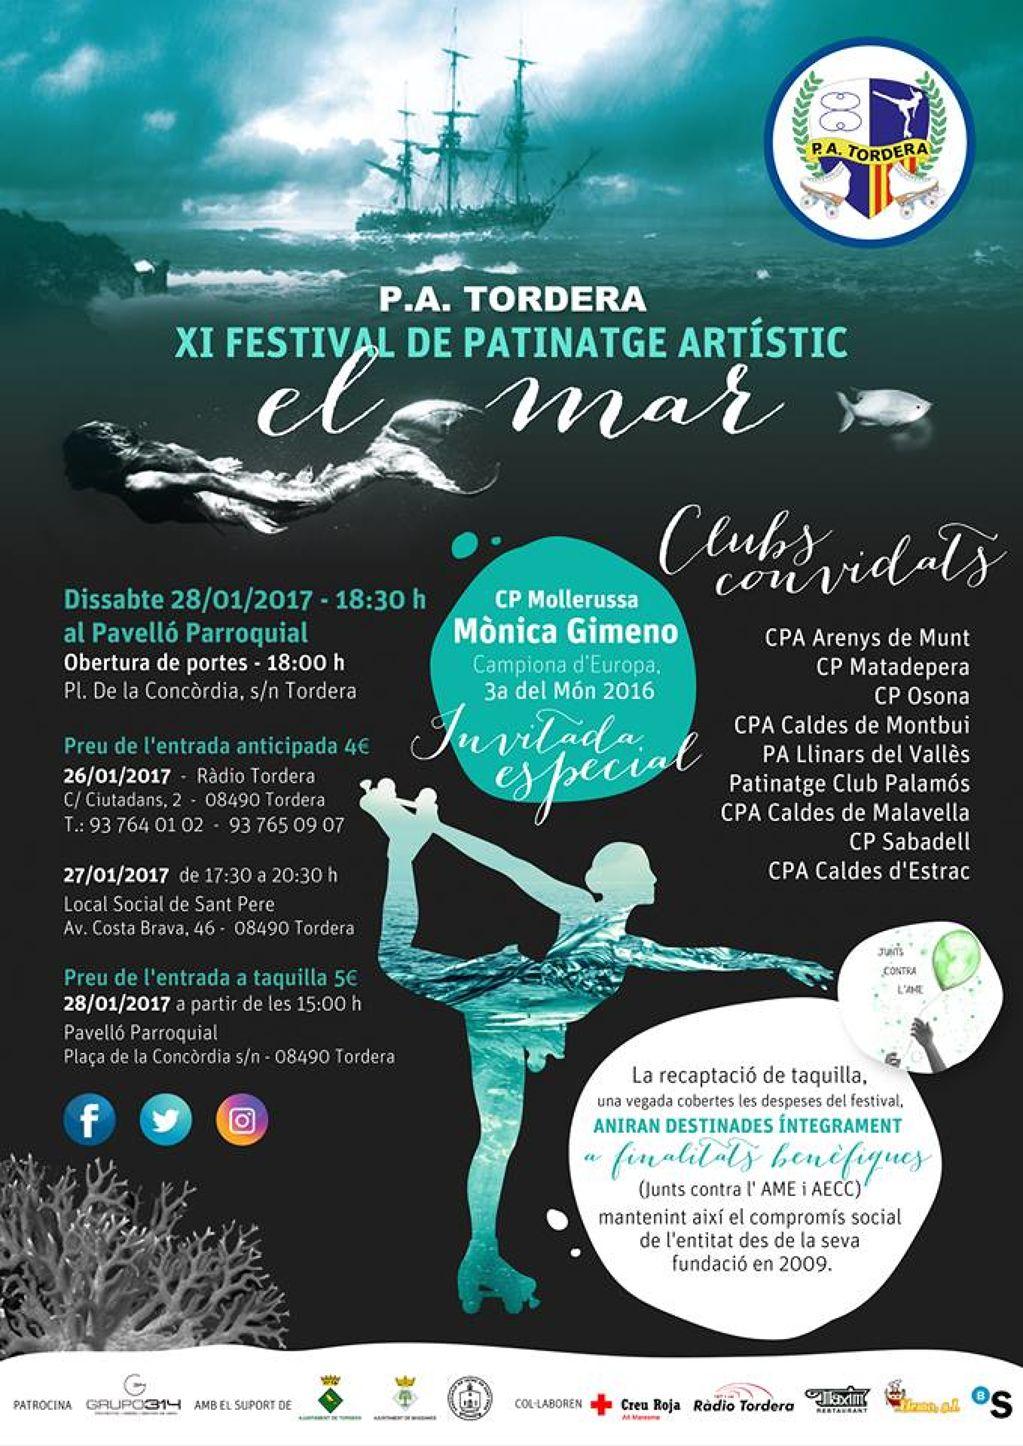 XI FESTIVAL PA TORDERA